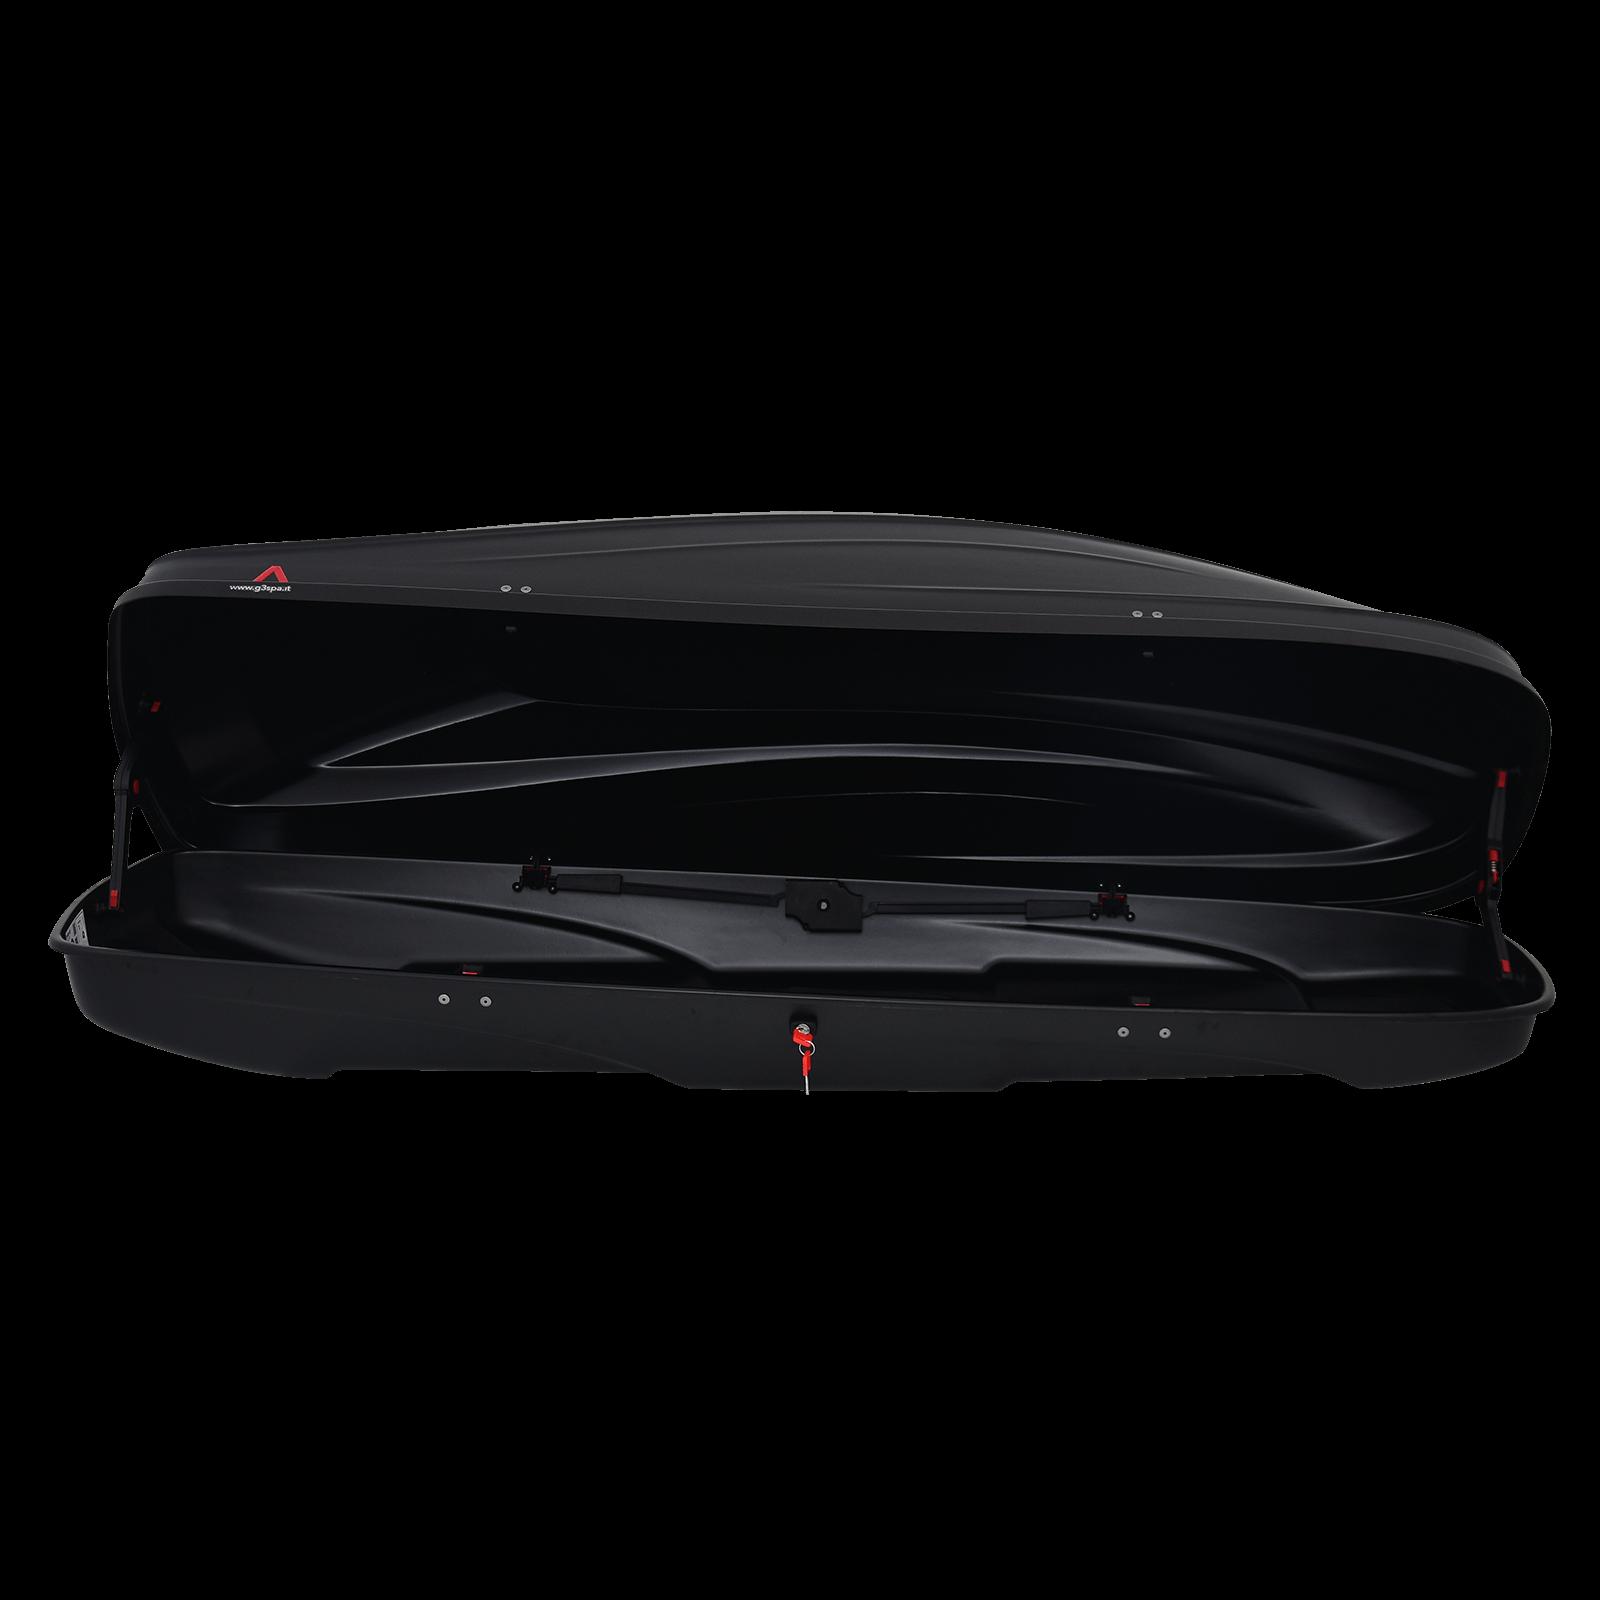 Dachbox G3 Spark 420 schwarz matt - Bild 2